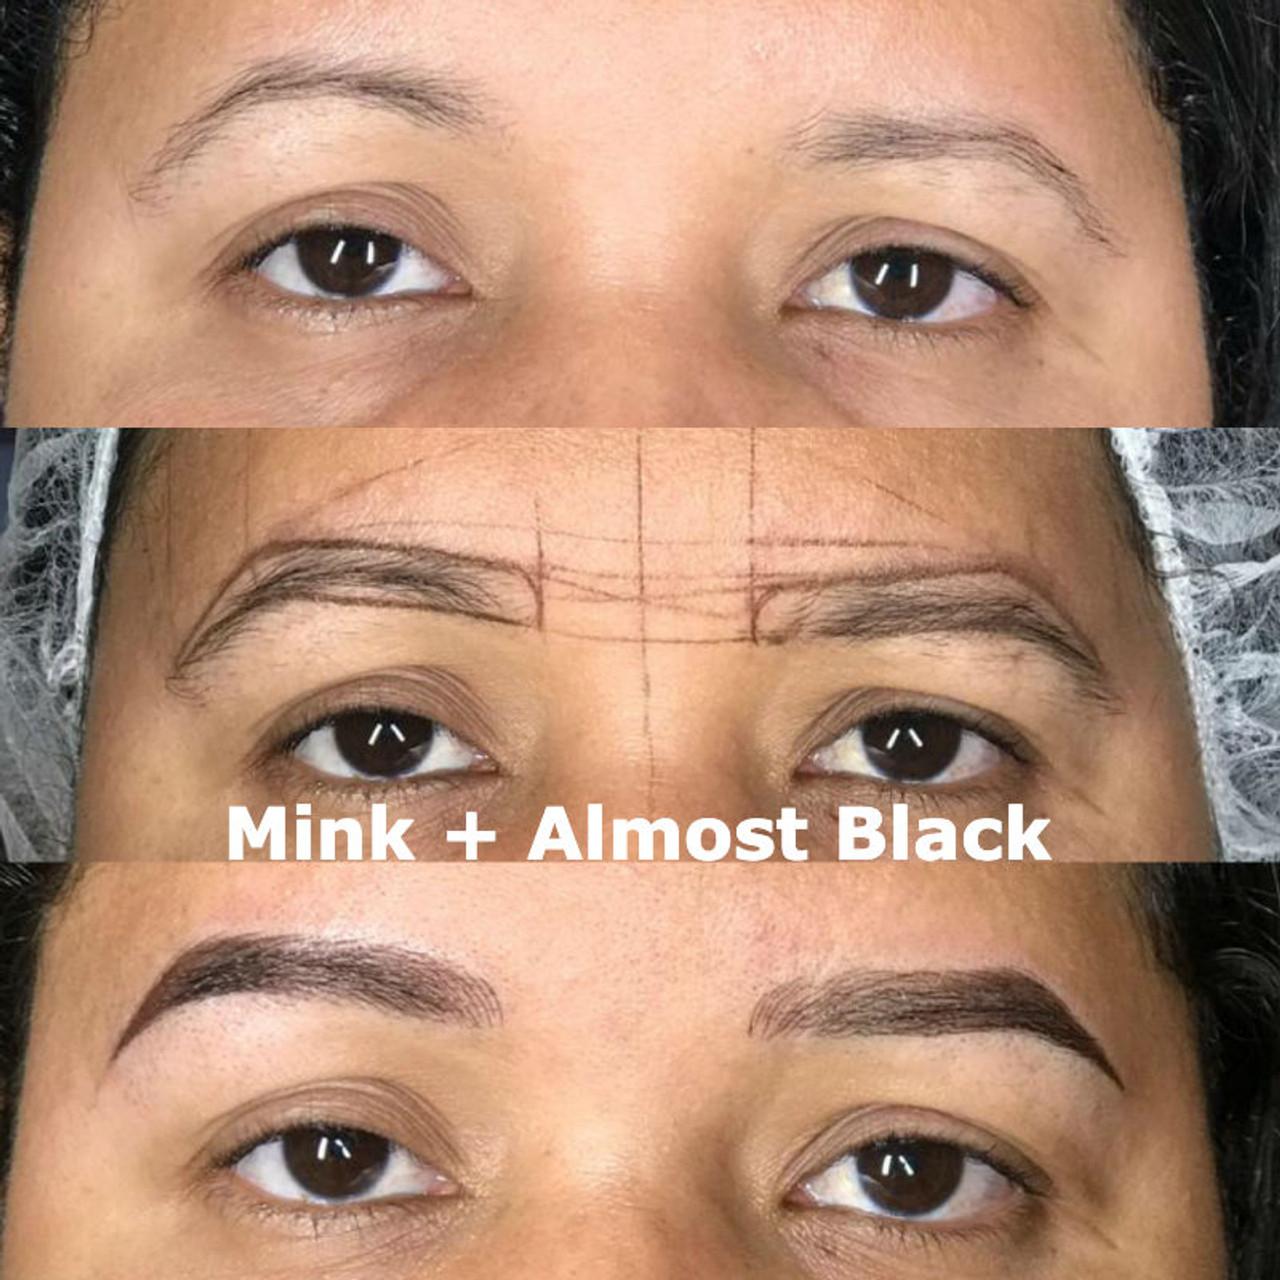 Kolorsource Permanent Makeup Pigment (PMU) Mink #3590 - 15ml